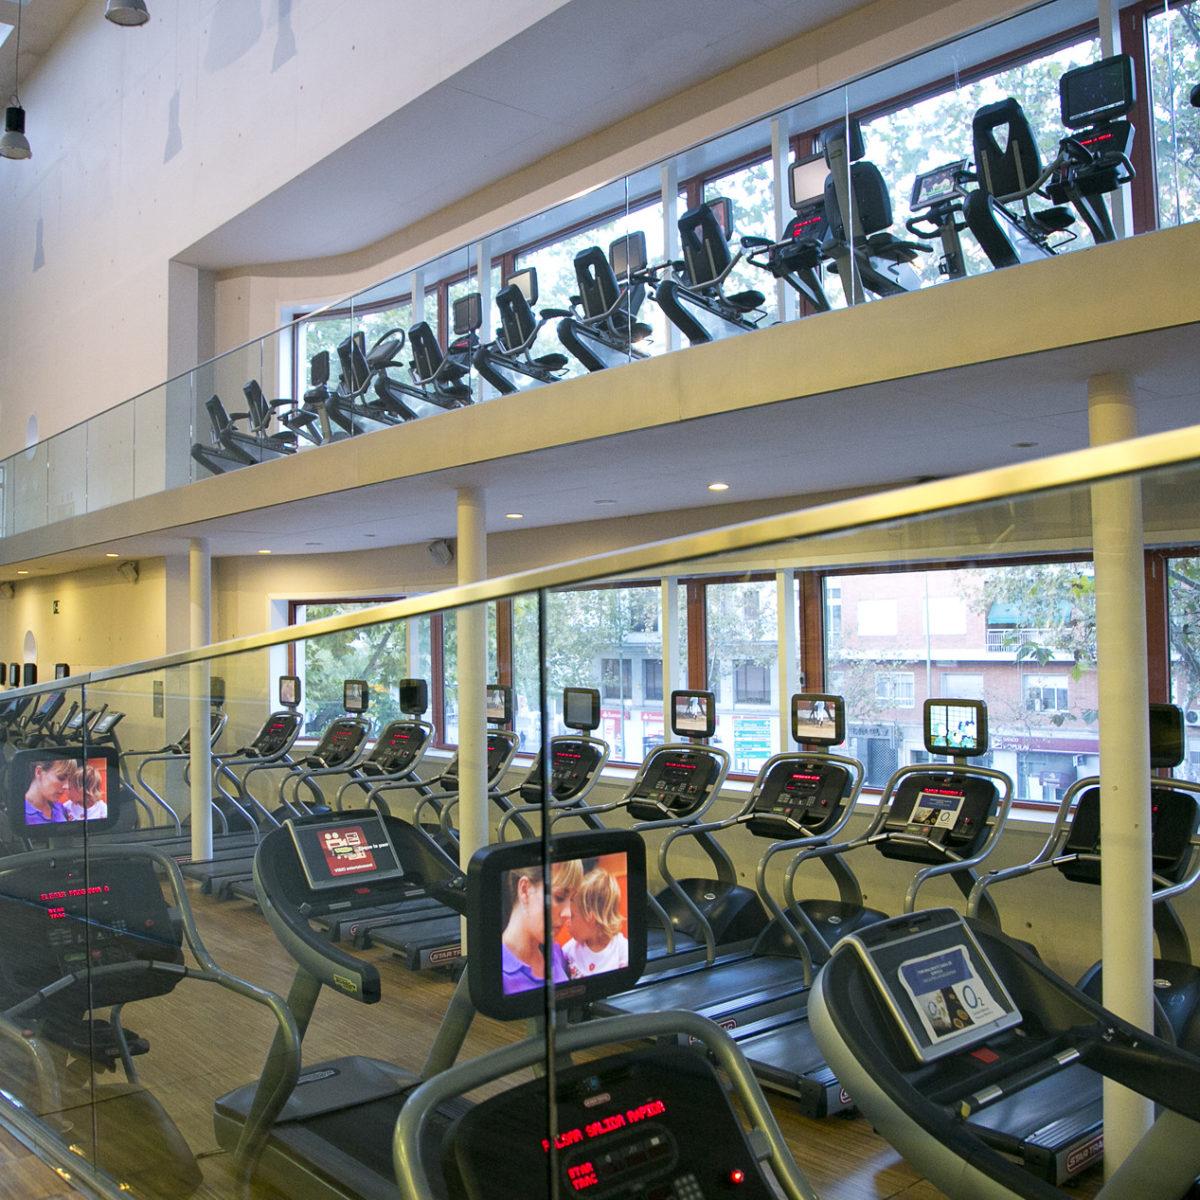 Gimnasio Piscinas Entrenamiento Personal O2 Centro Wellness